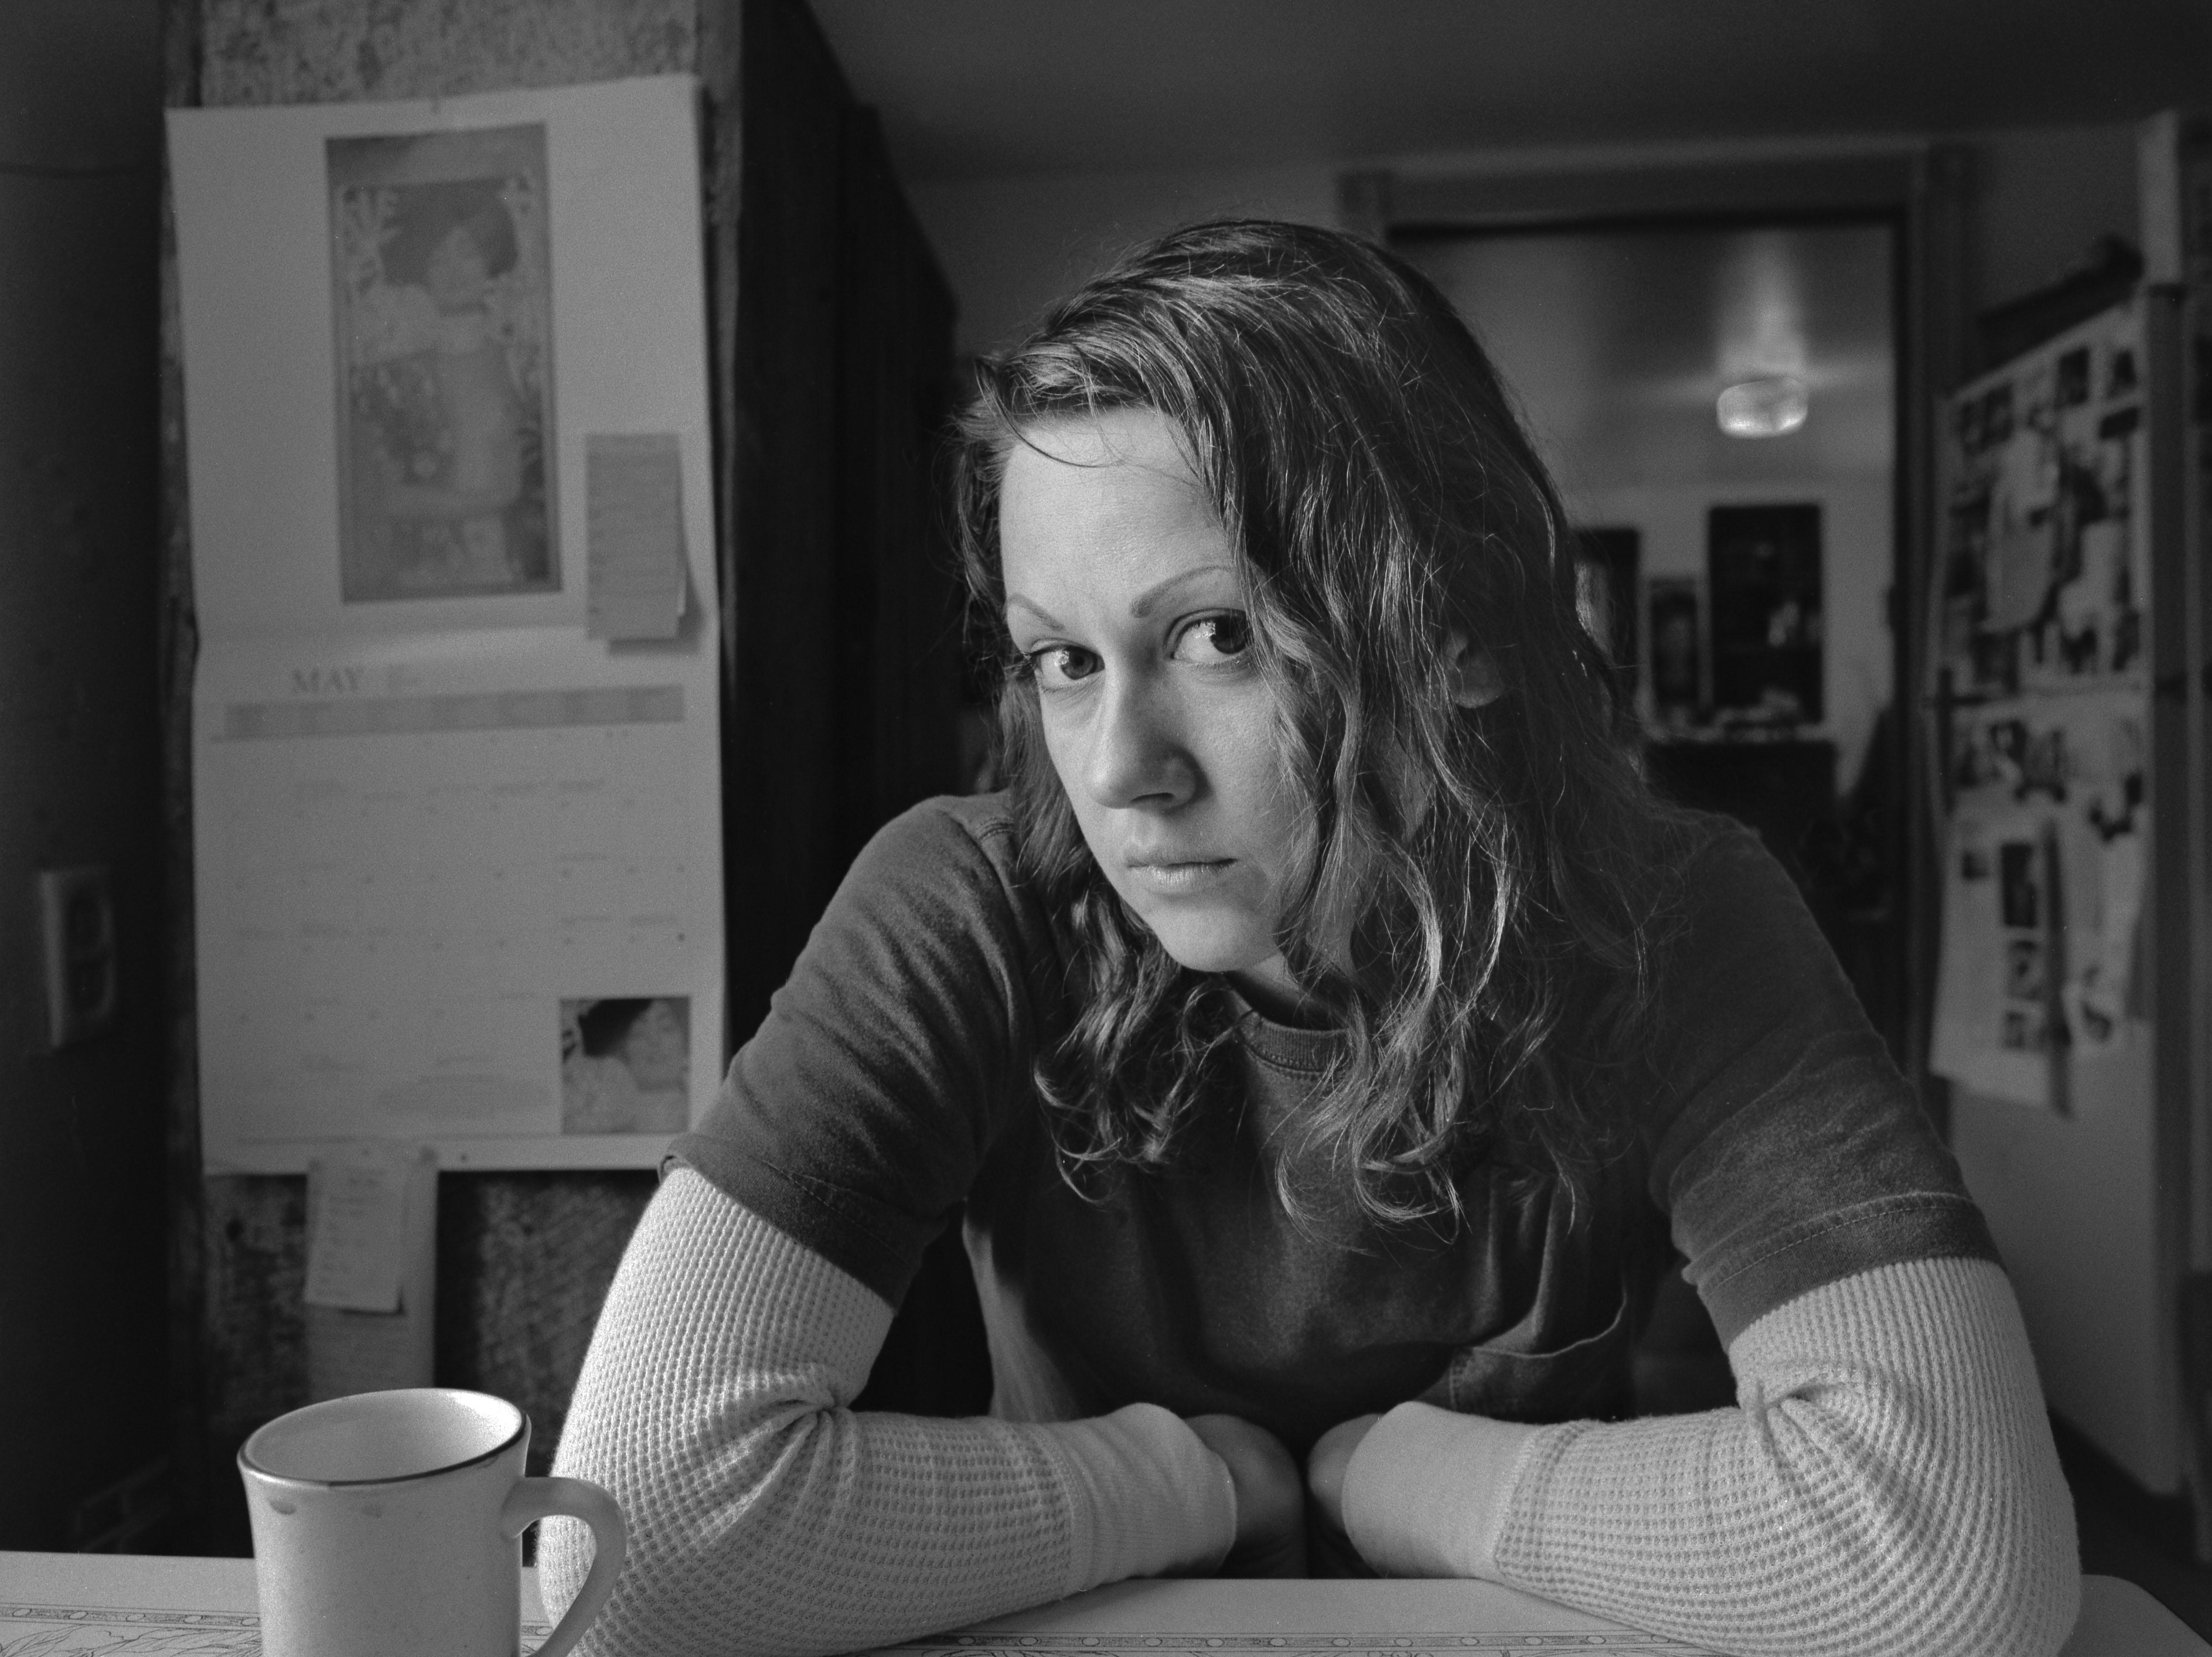 2006 Alison at Kitchen table, Occoquan, VA